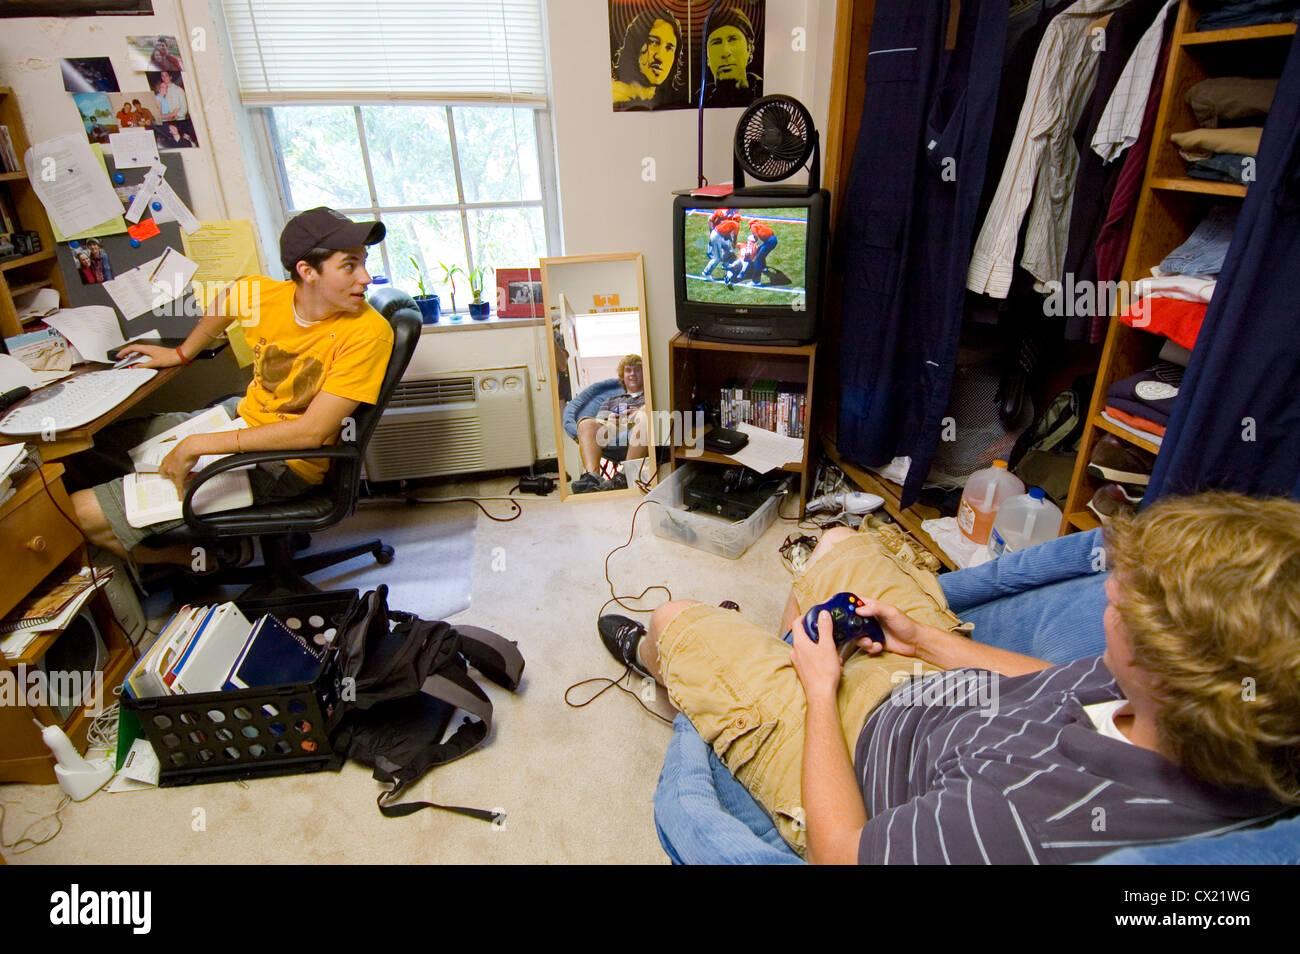 games college dorm